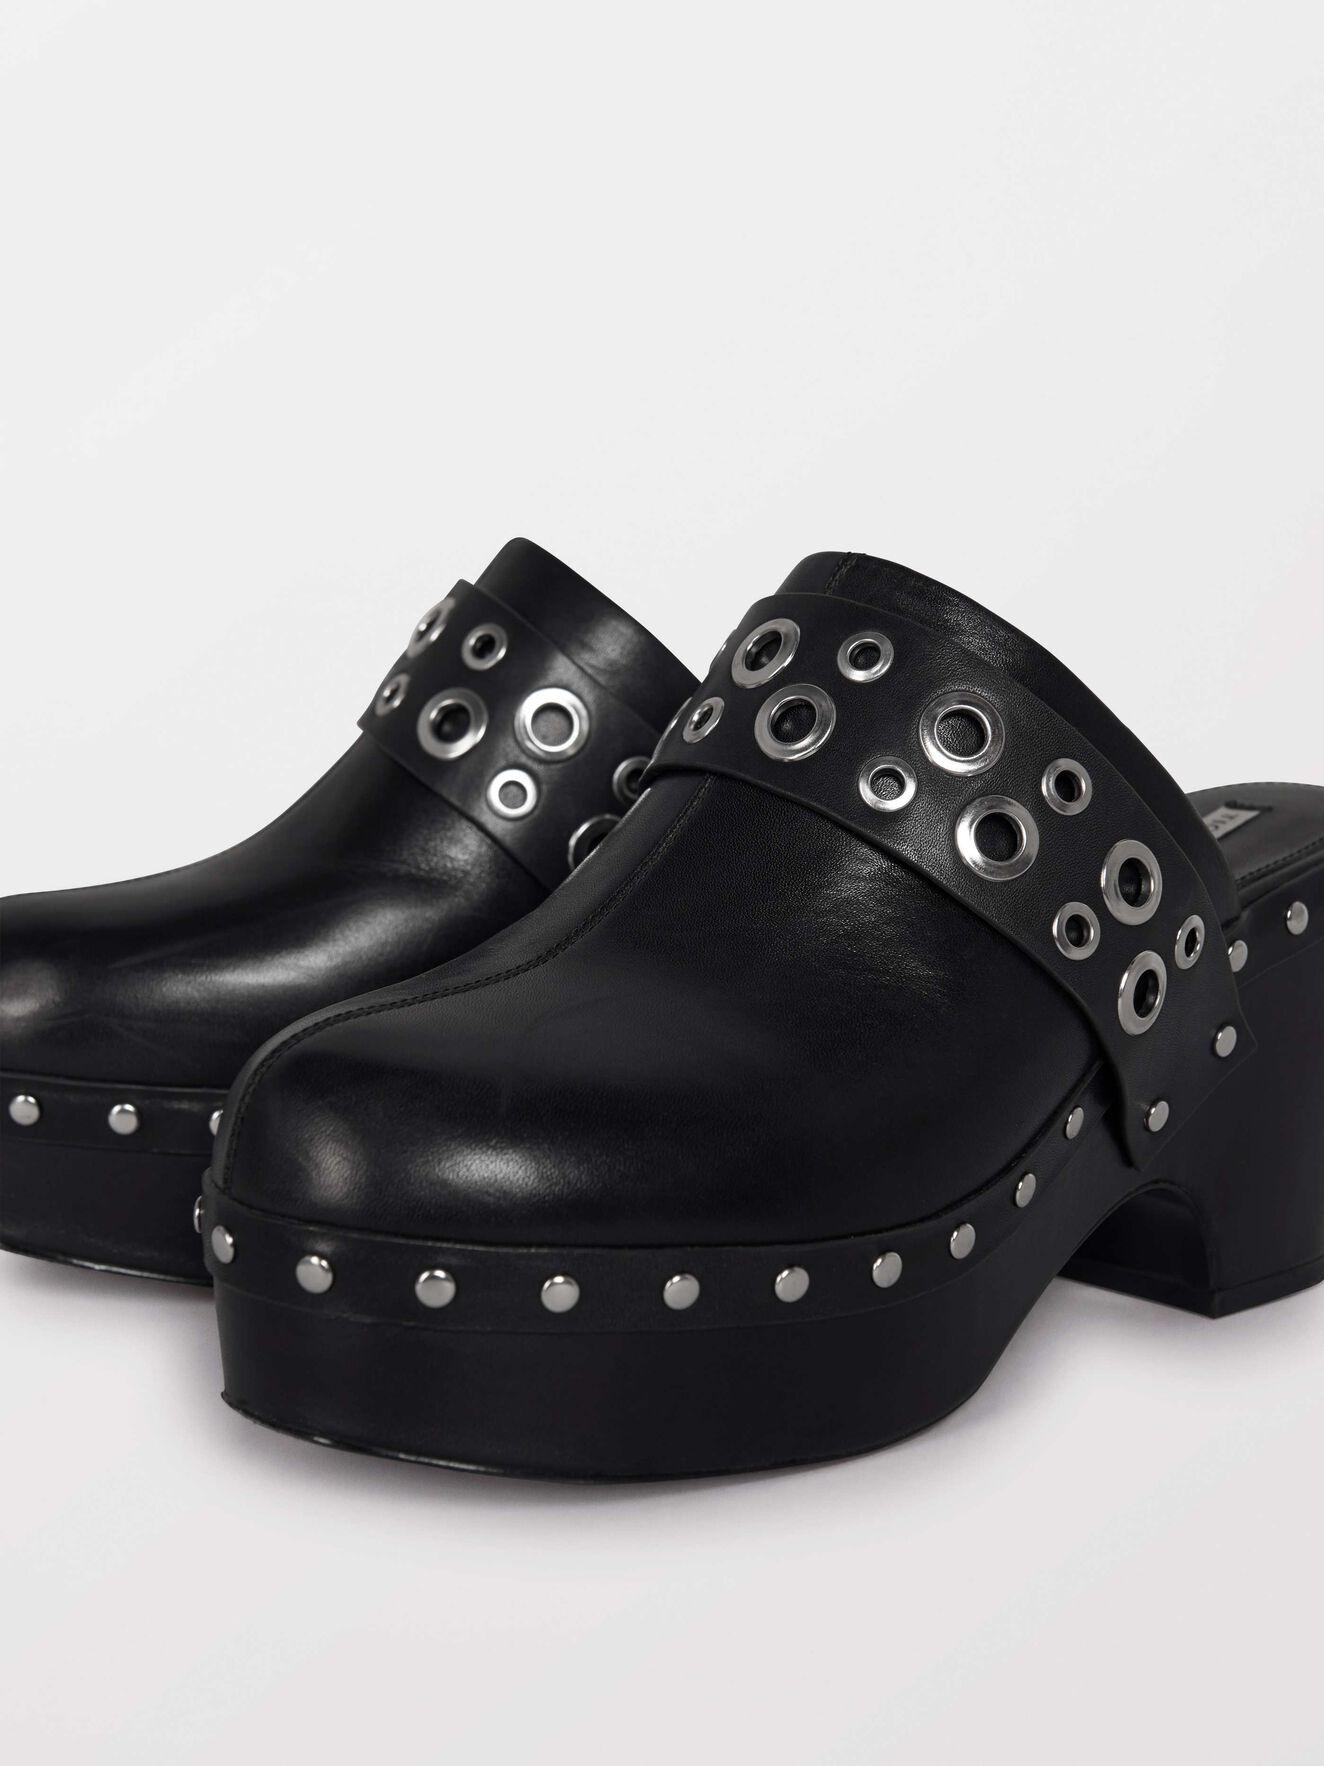 Snoccoli Shoes in Black from Tiger of Sweden